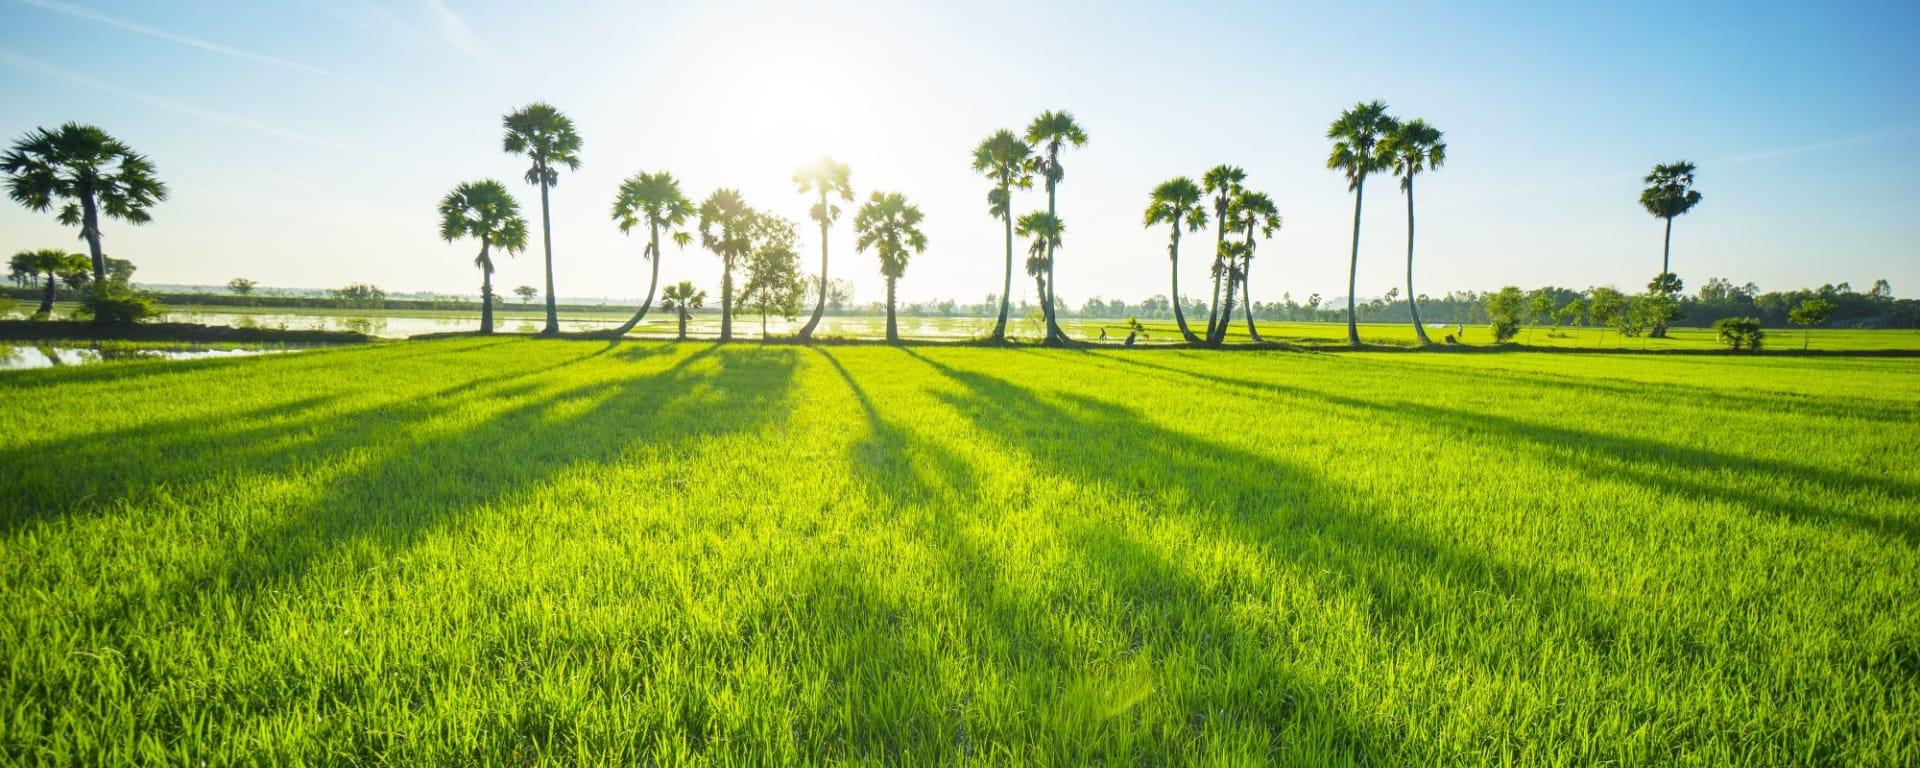 Le delta du Mékong – de Saigon à Phnom Penh: Mekong Delta: beautiful countryside